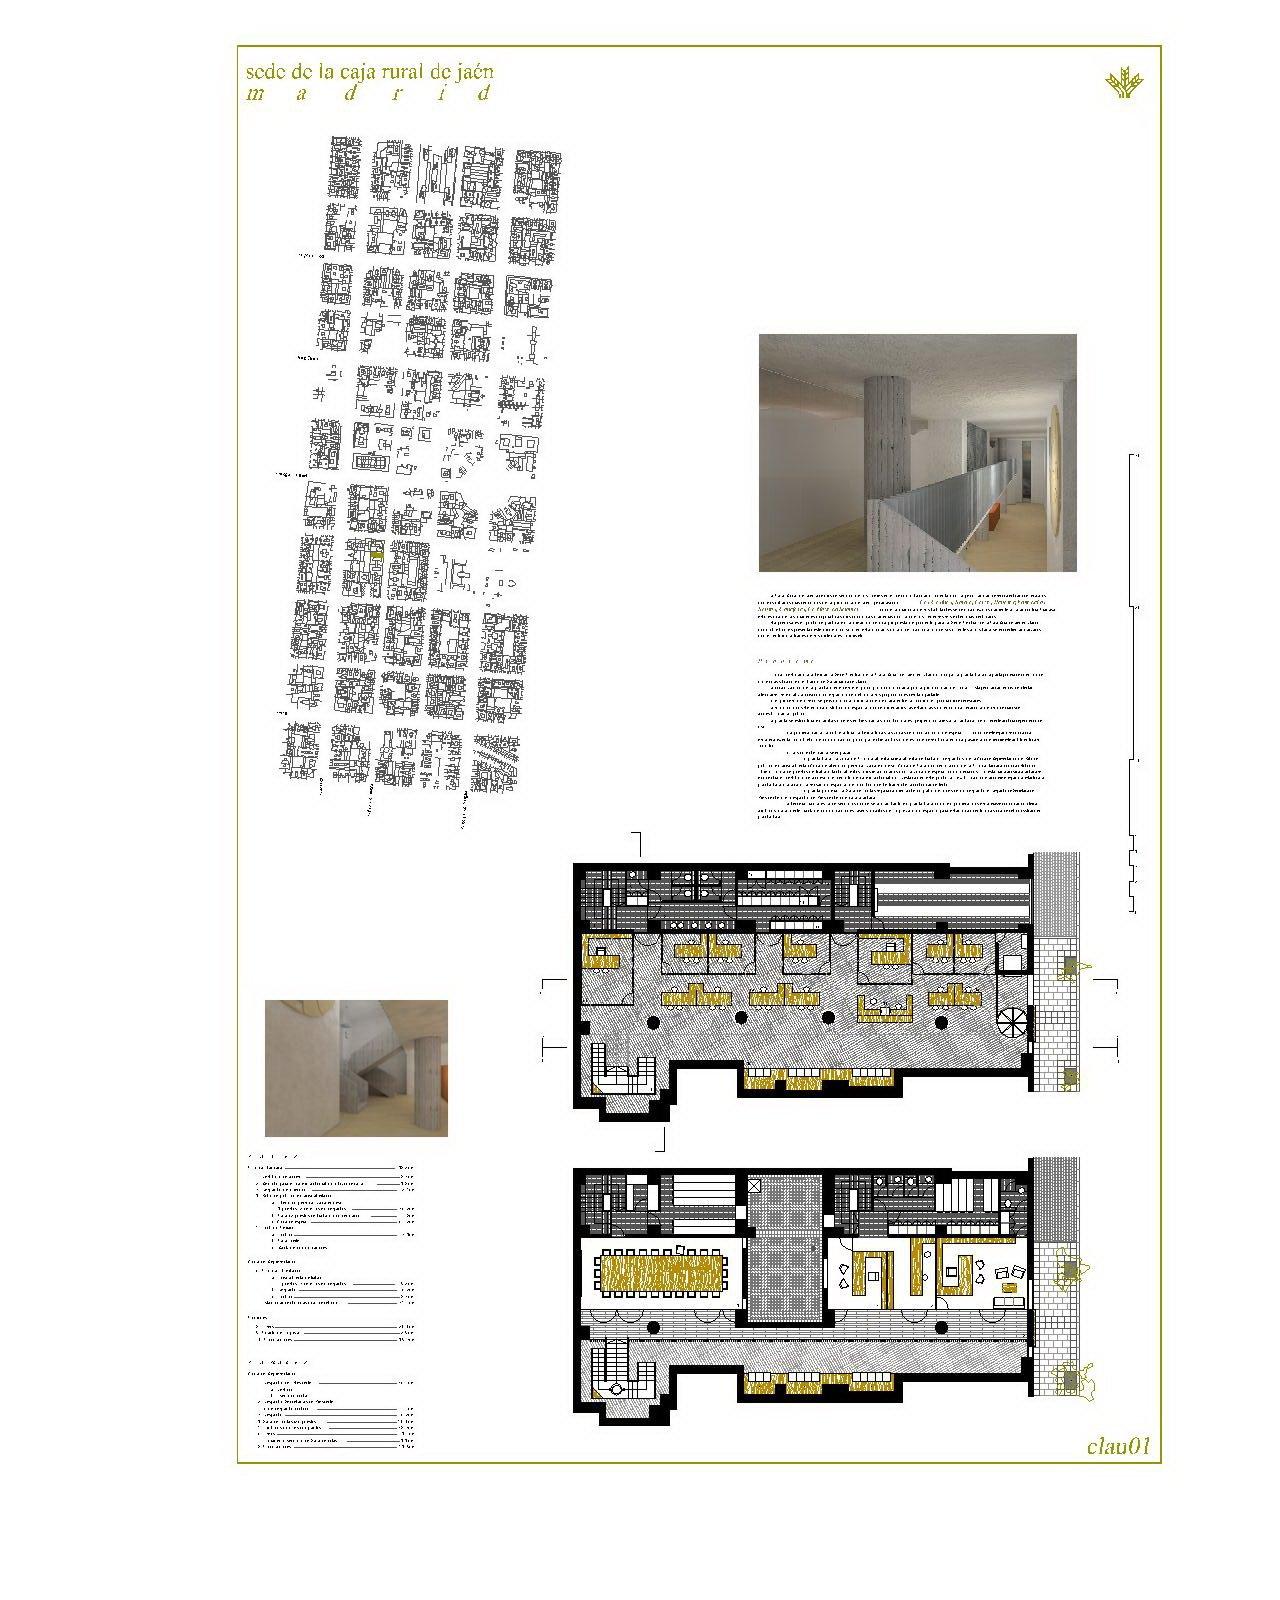 Sede caja rural de ja n ianua arquitectura for Caja rural jaen oficinas